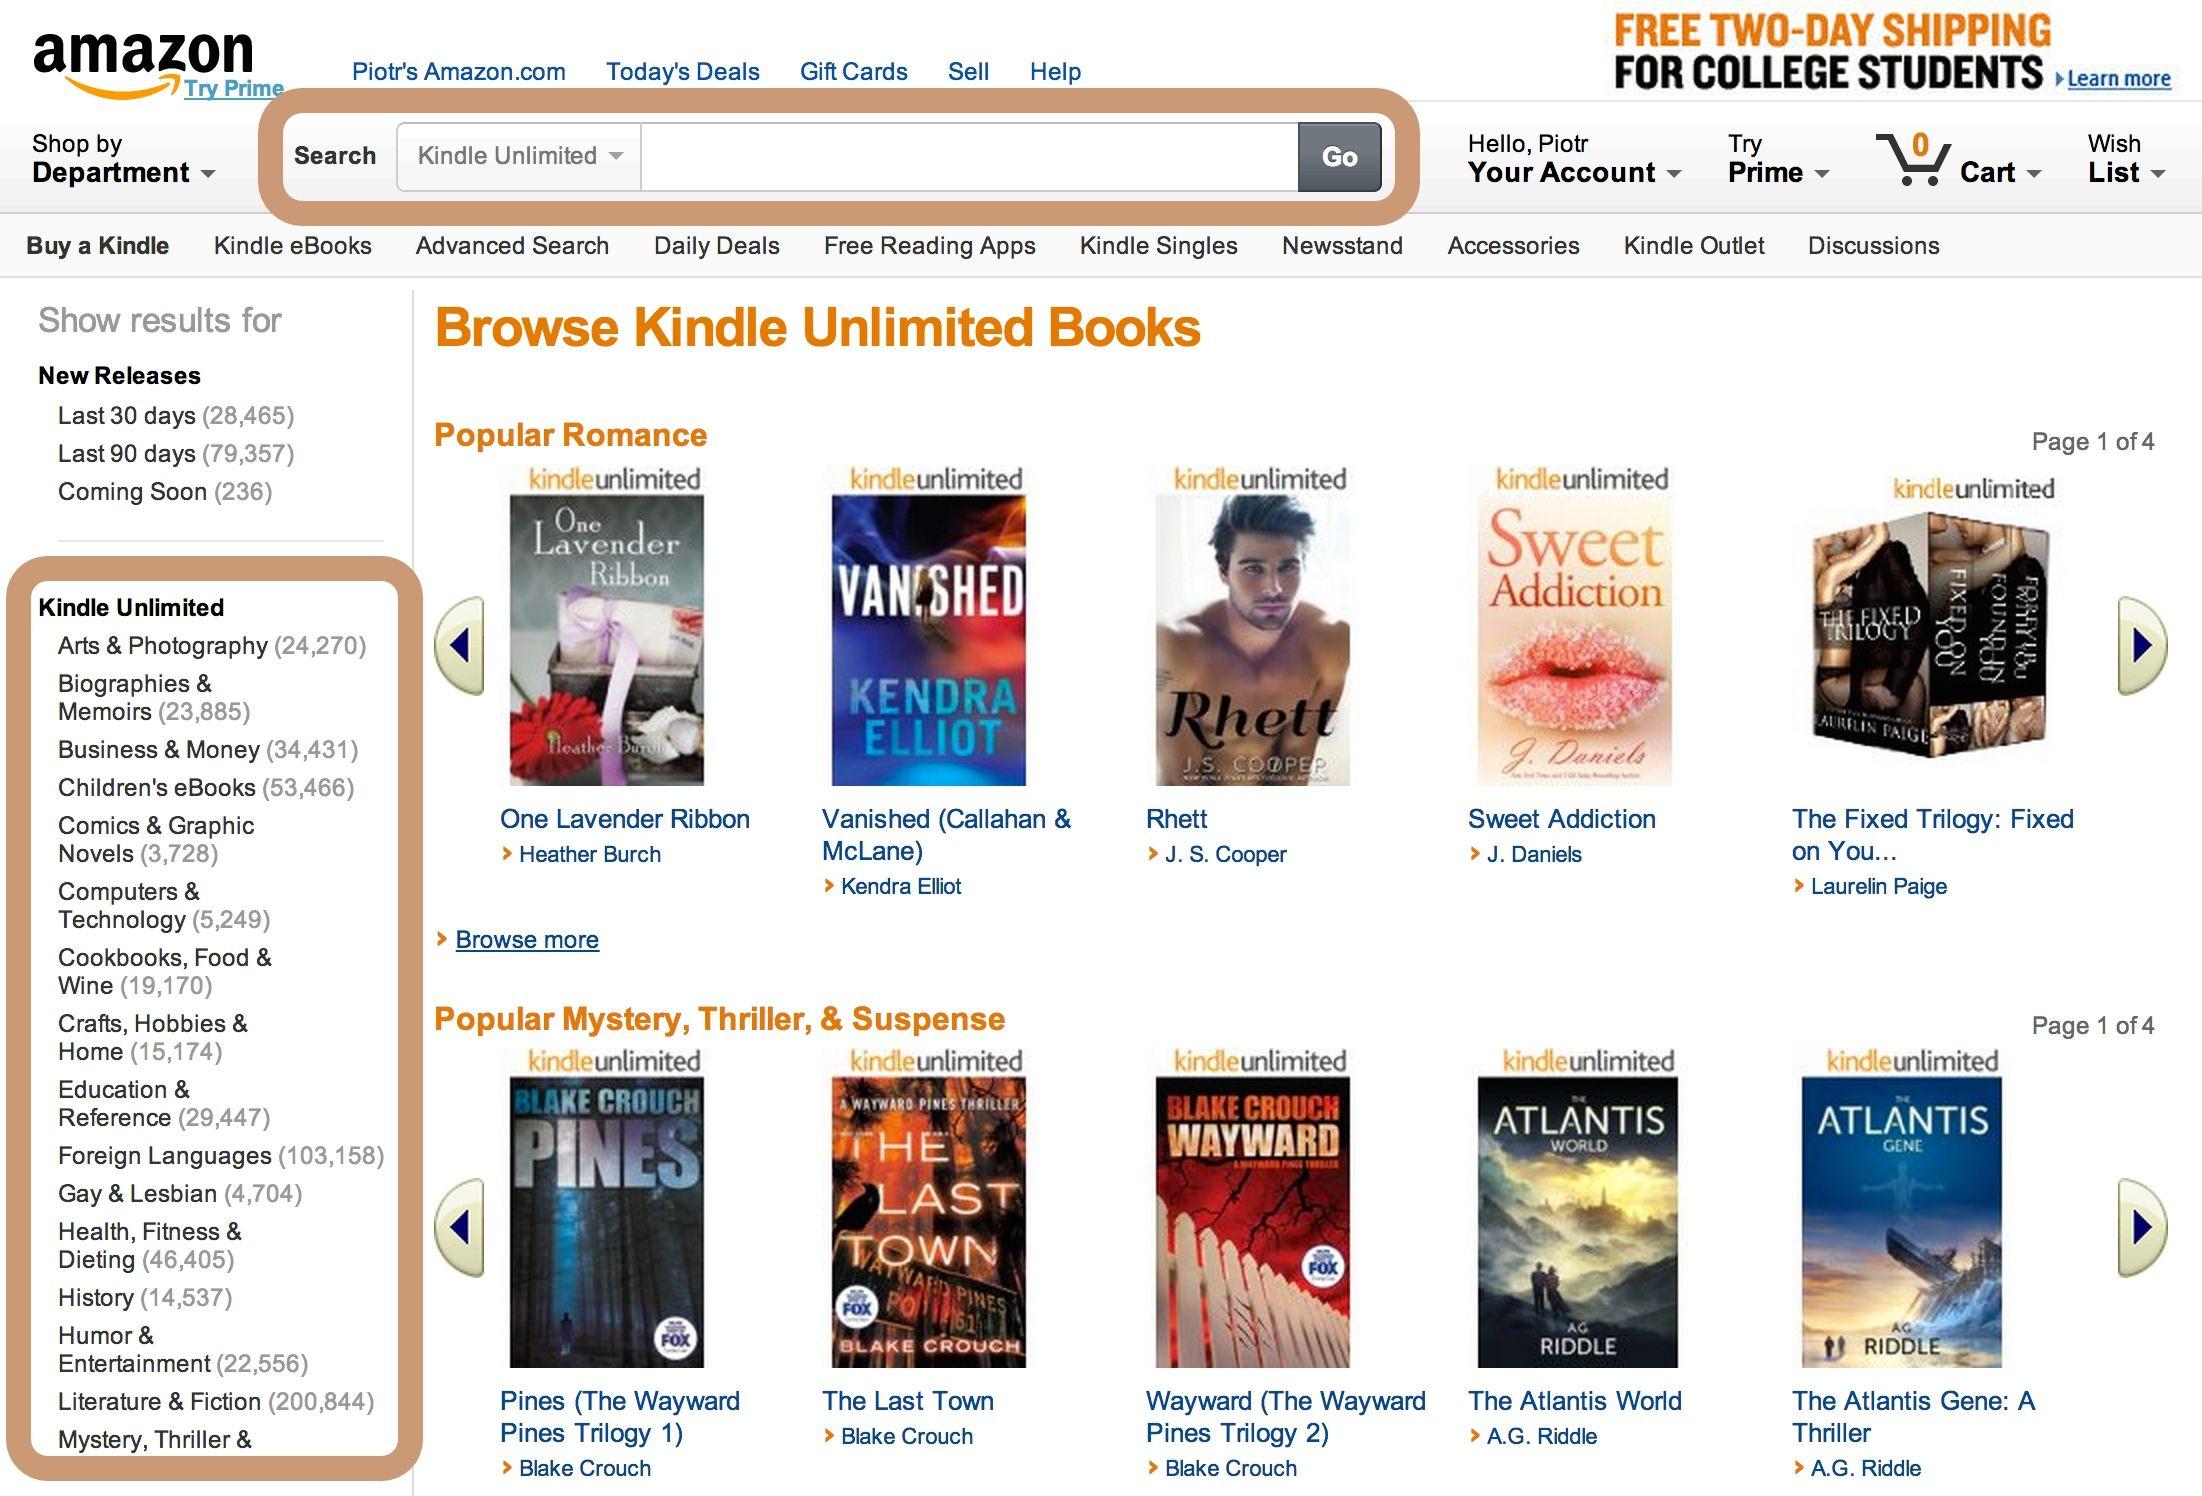 4 ways to find Kindle Unlimited ebooks on Amazon Kindle